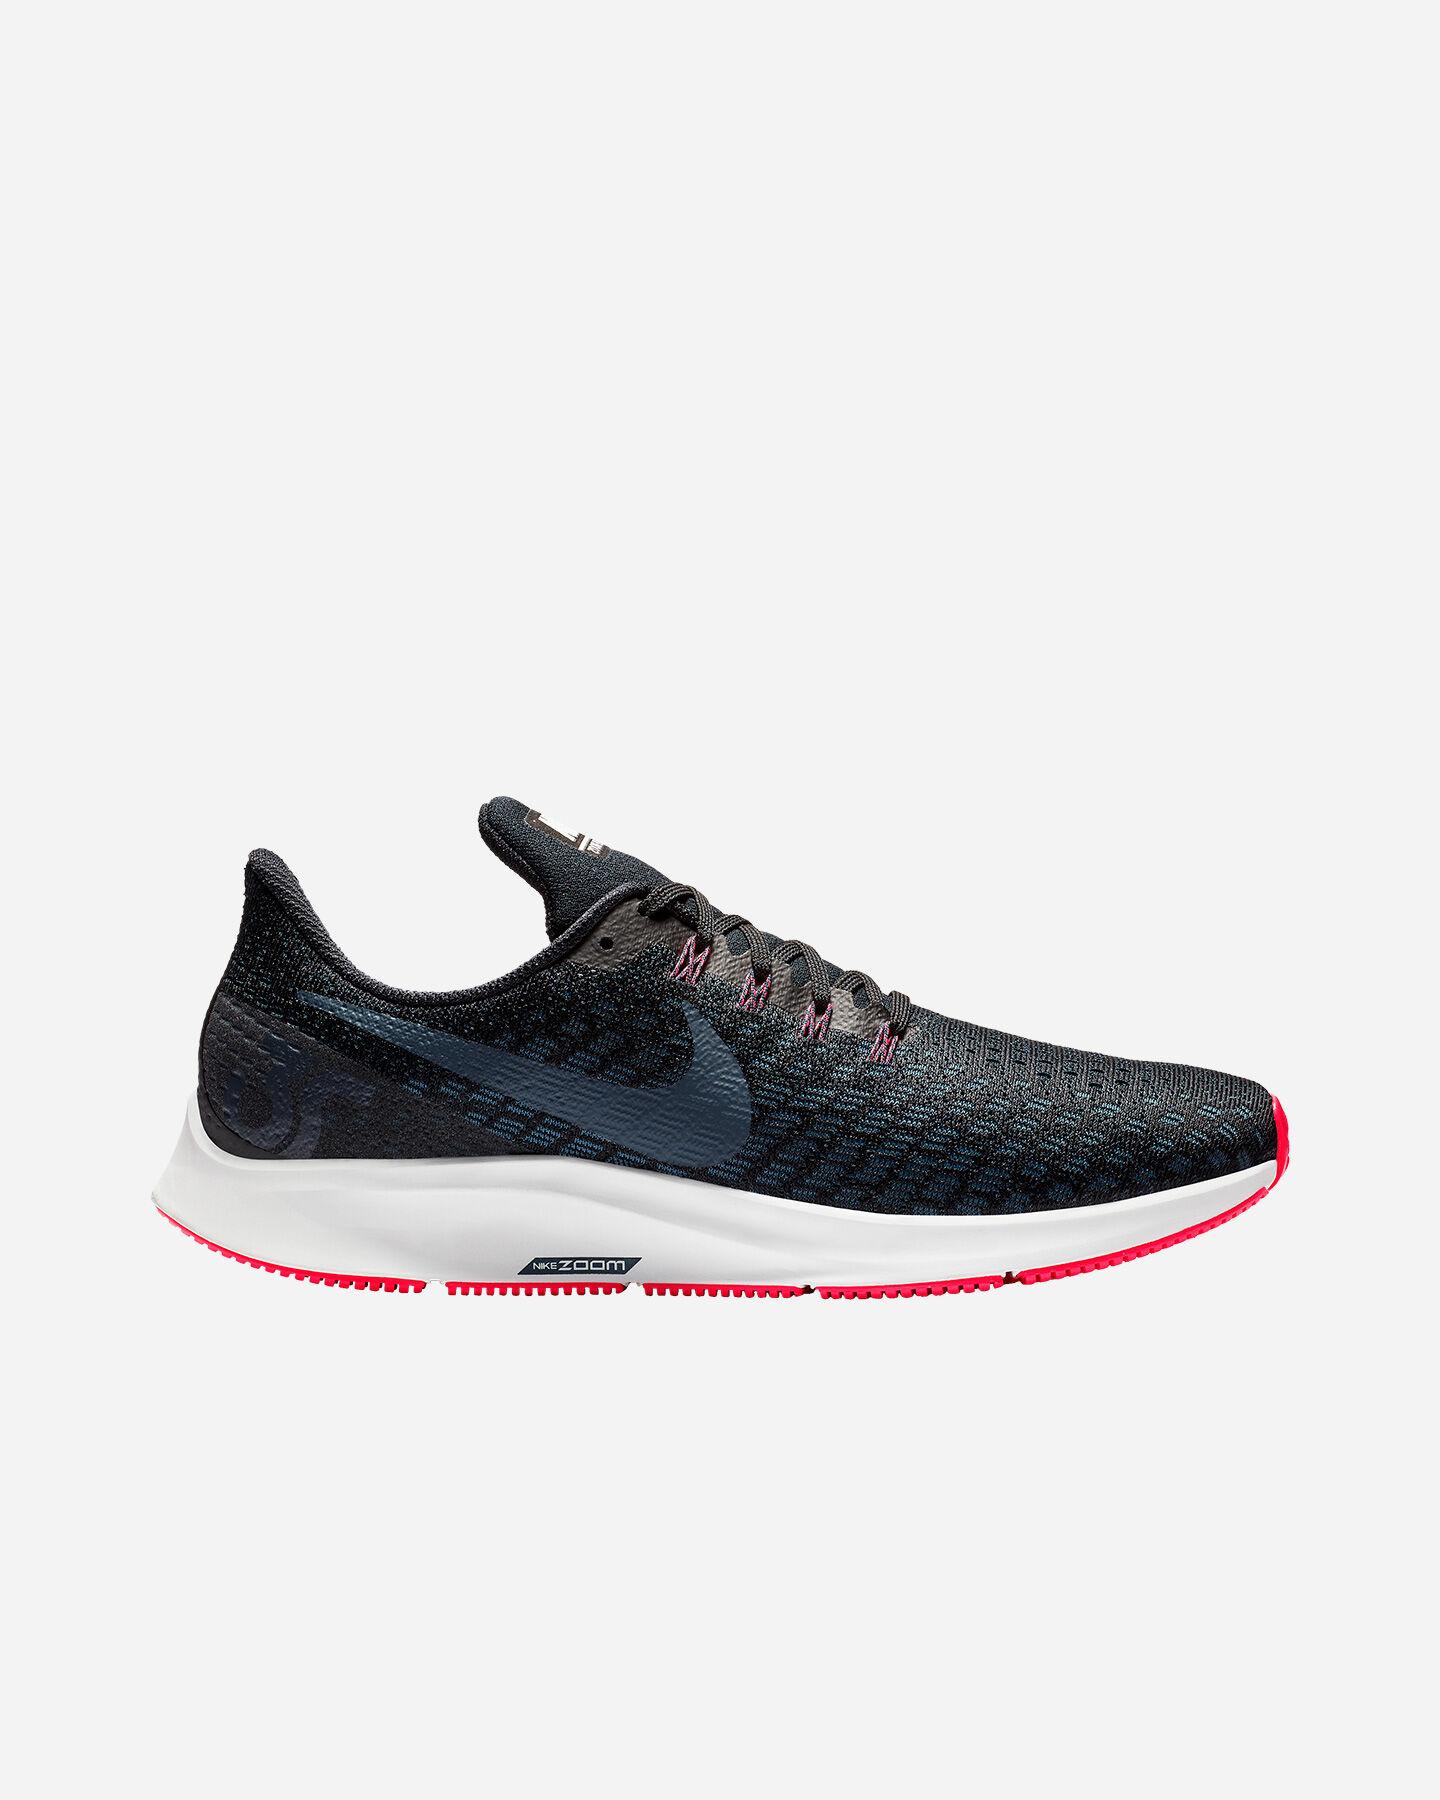 scarpe nike running uomo offerta